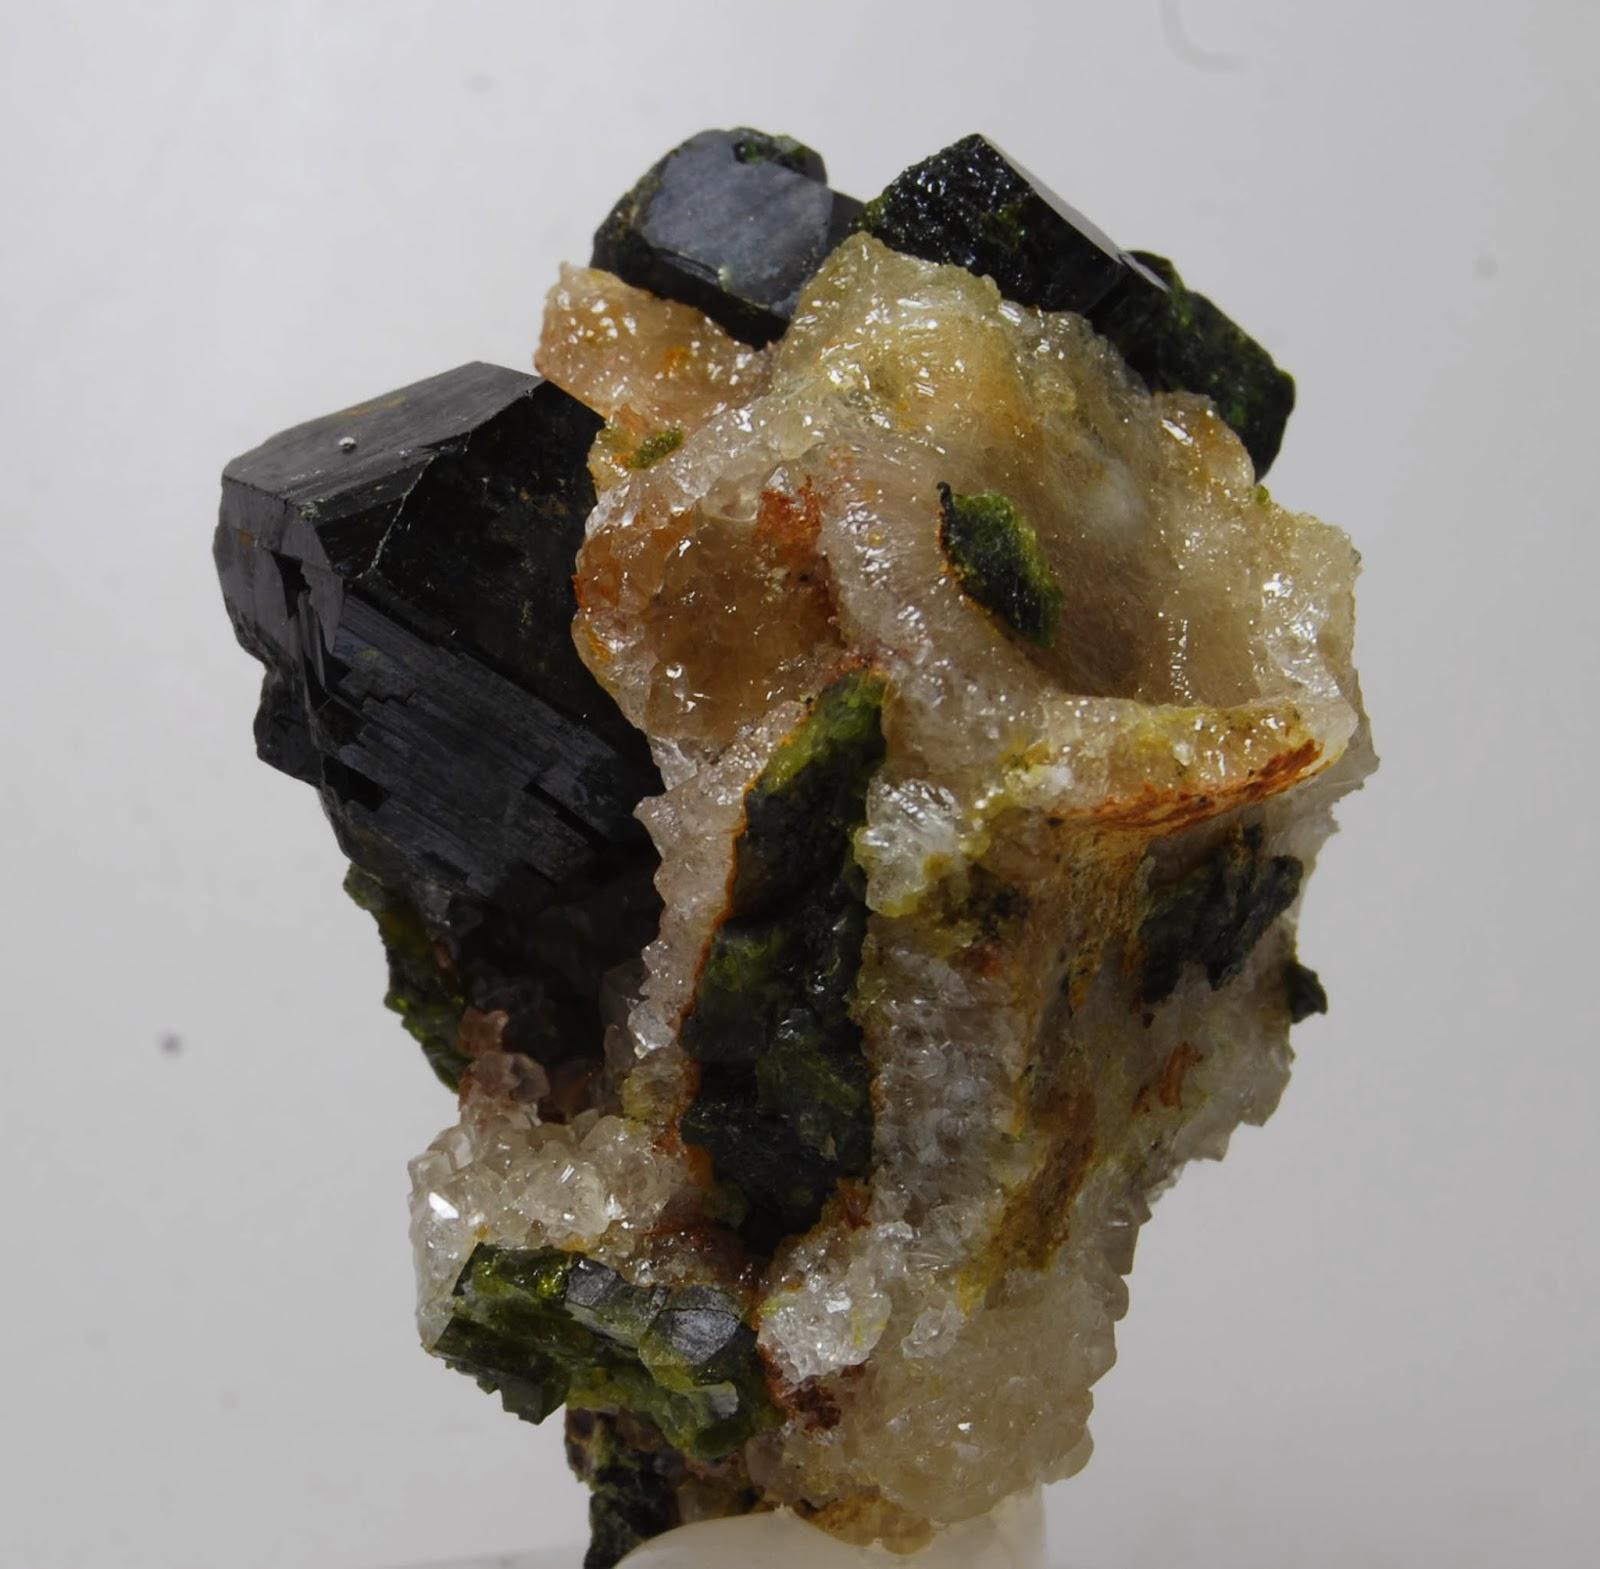 colección R. Fimia Epidota,+Handan+Iron+Mine,+Wu'an+County,+Handan,+Hebei,++China